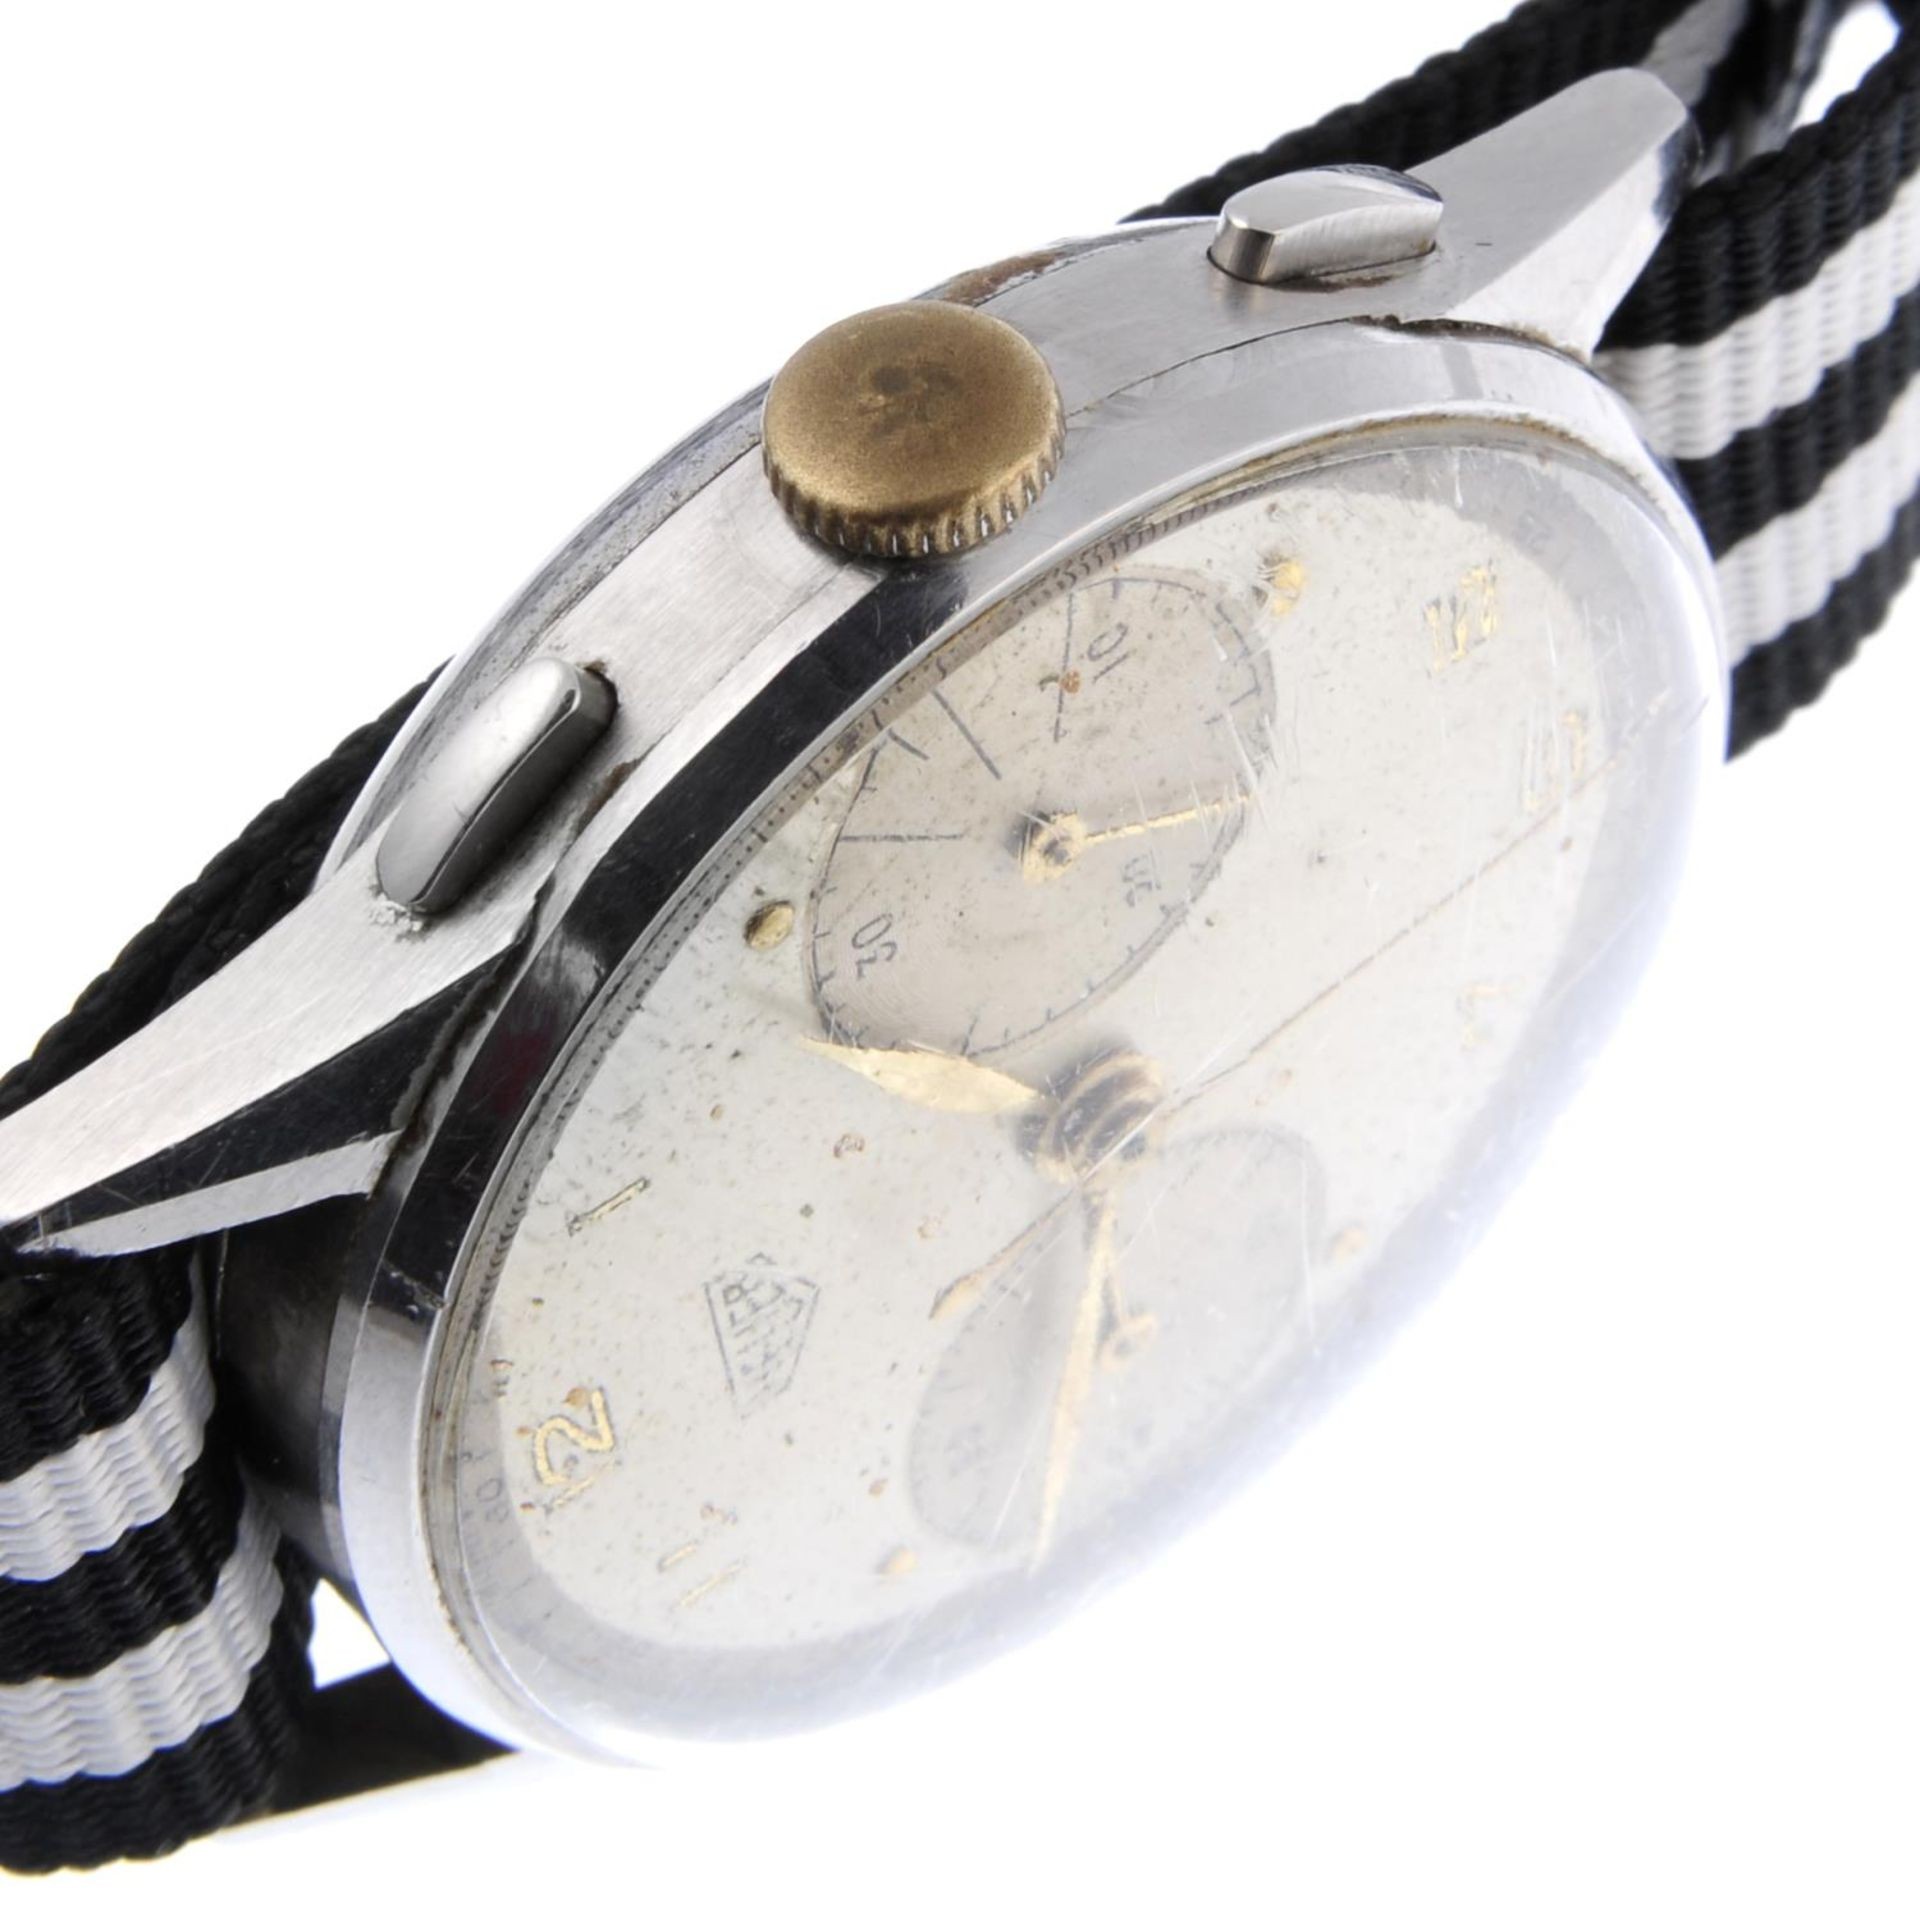 Los 32 - HEUER - a gentleman's chronograph wrist watch.